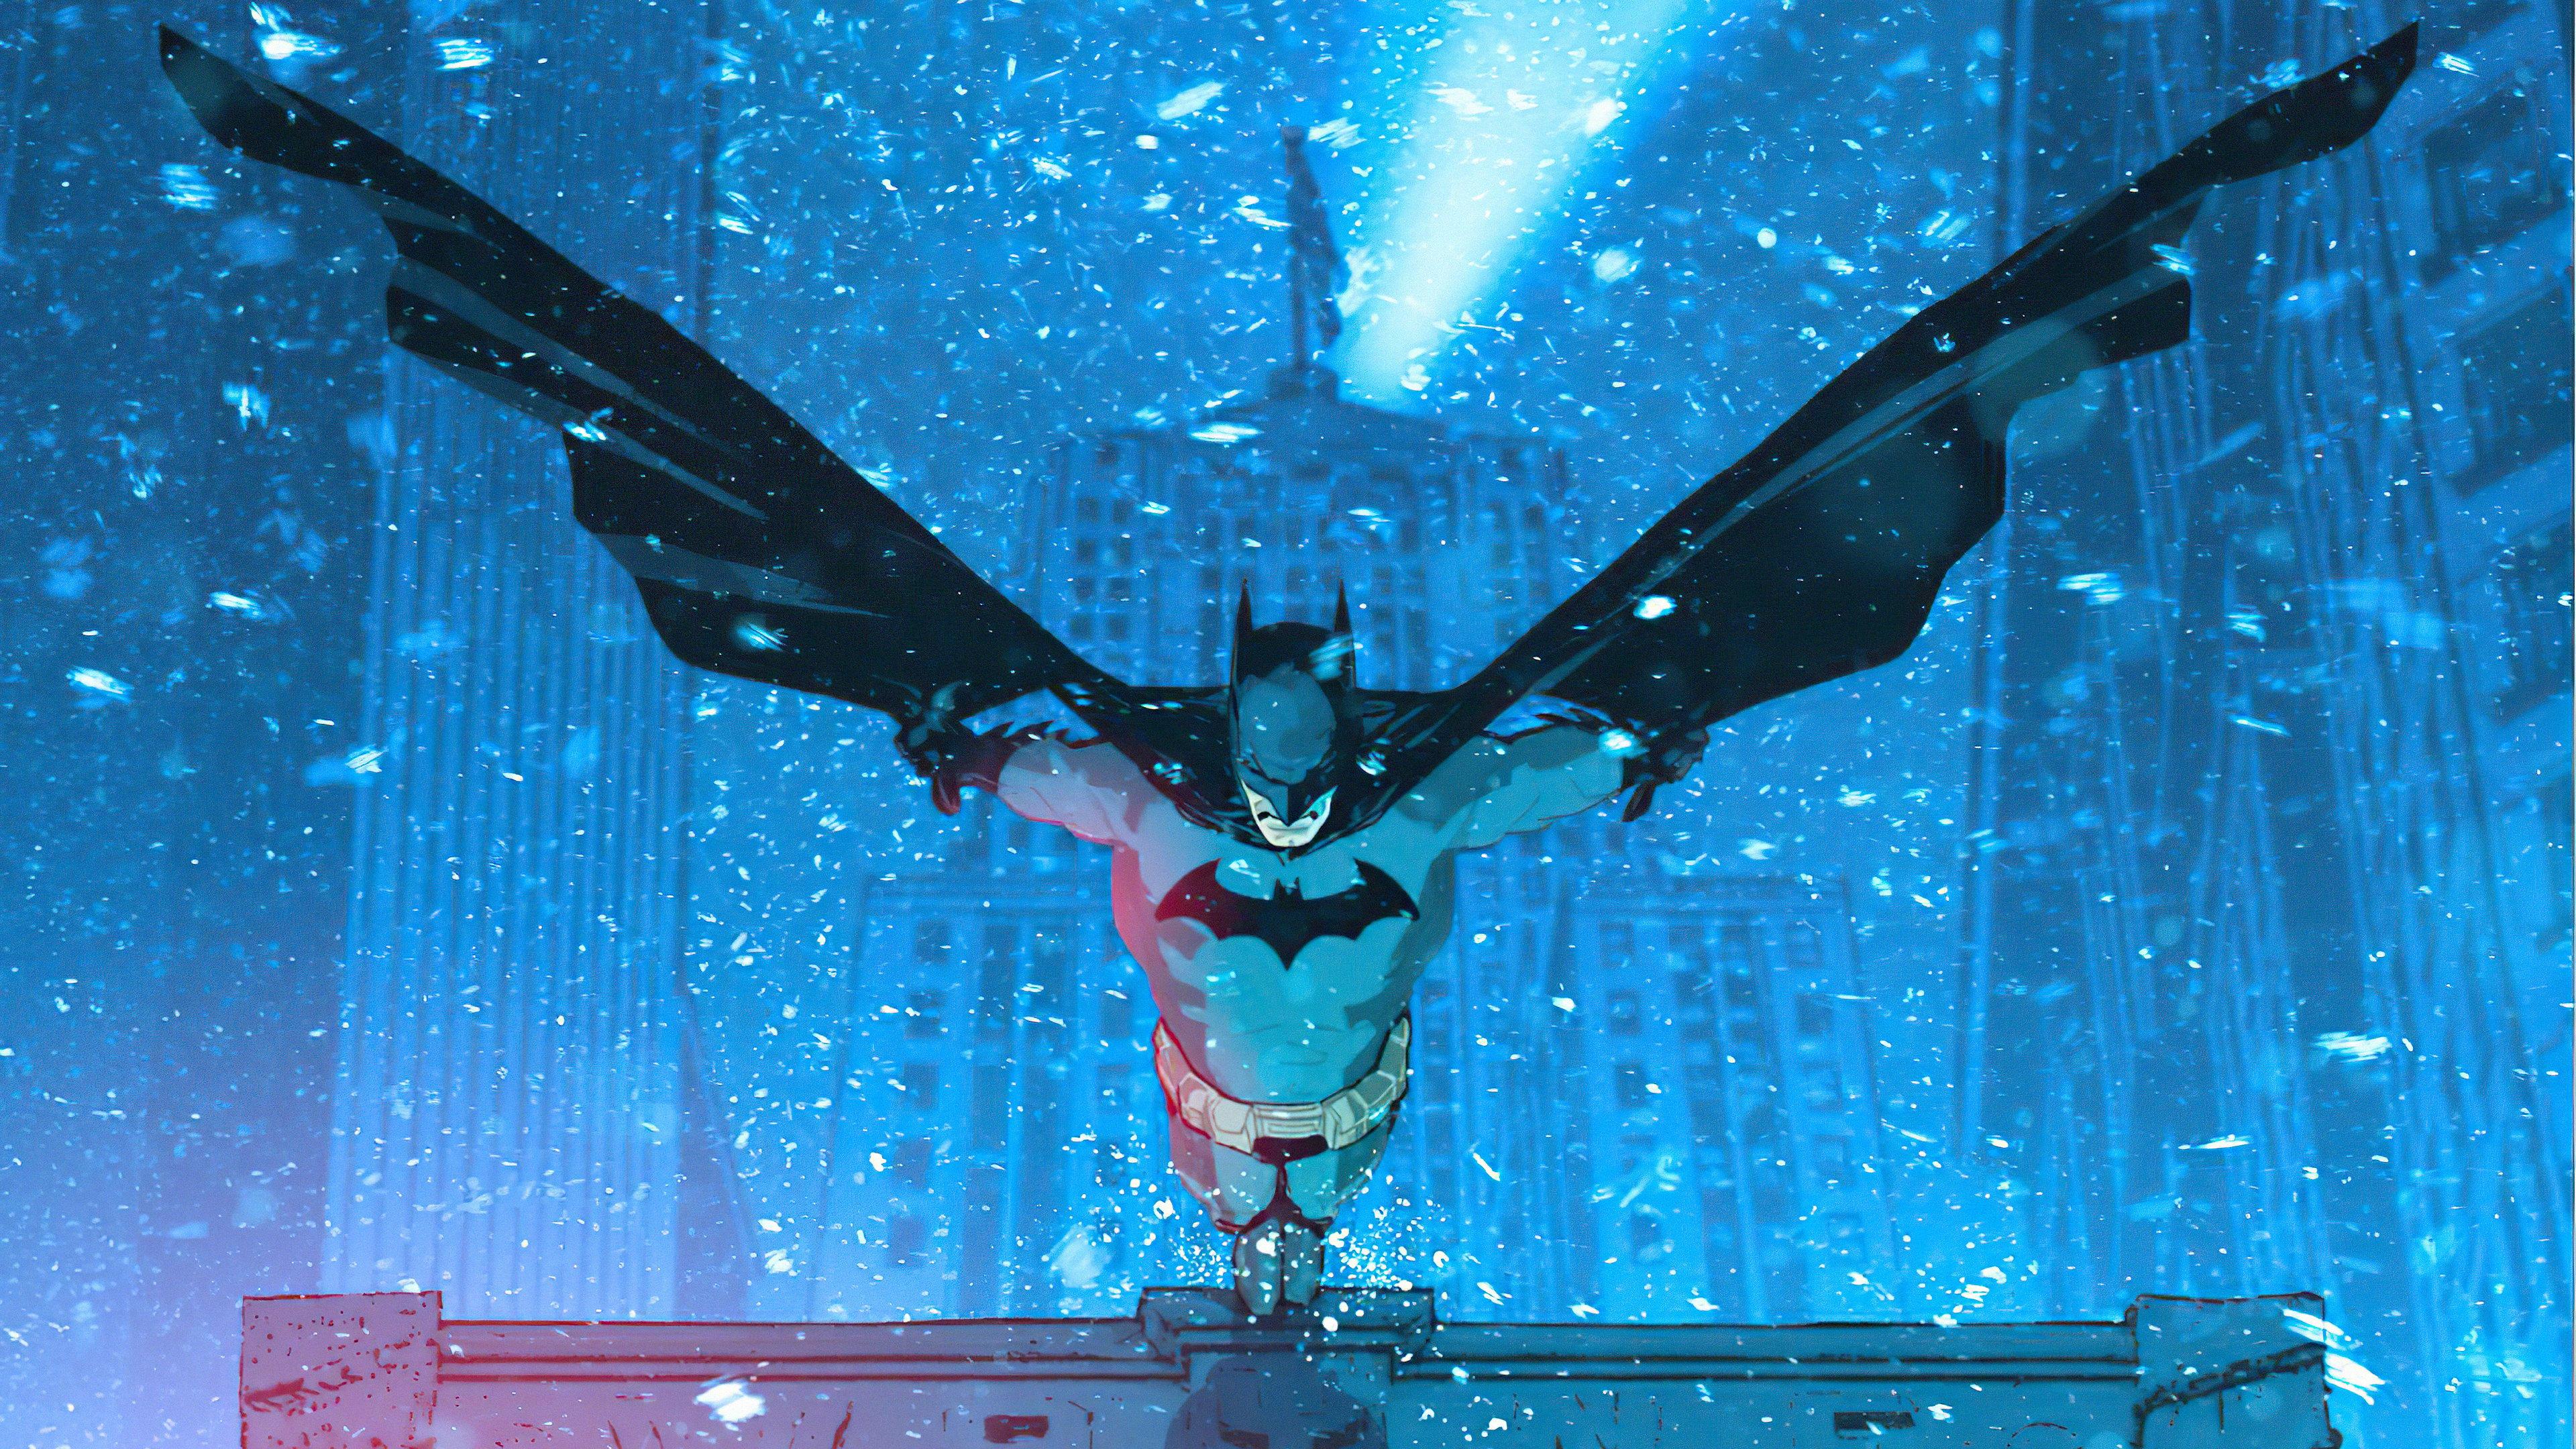 Wallpaper Batman in the city